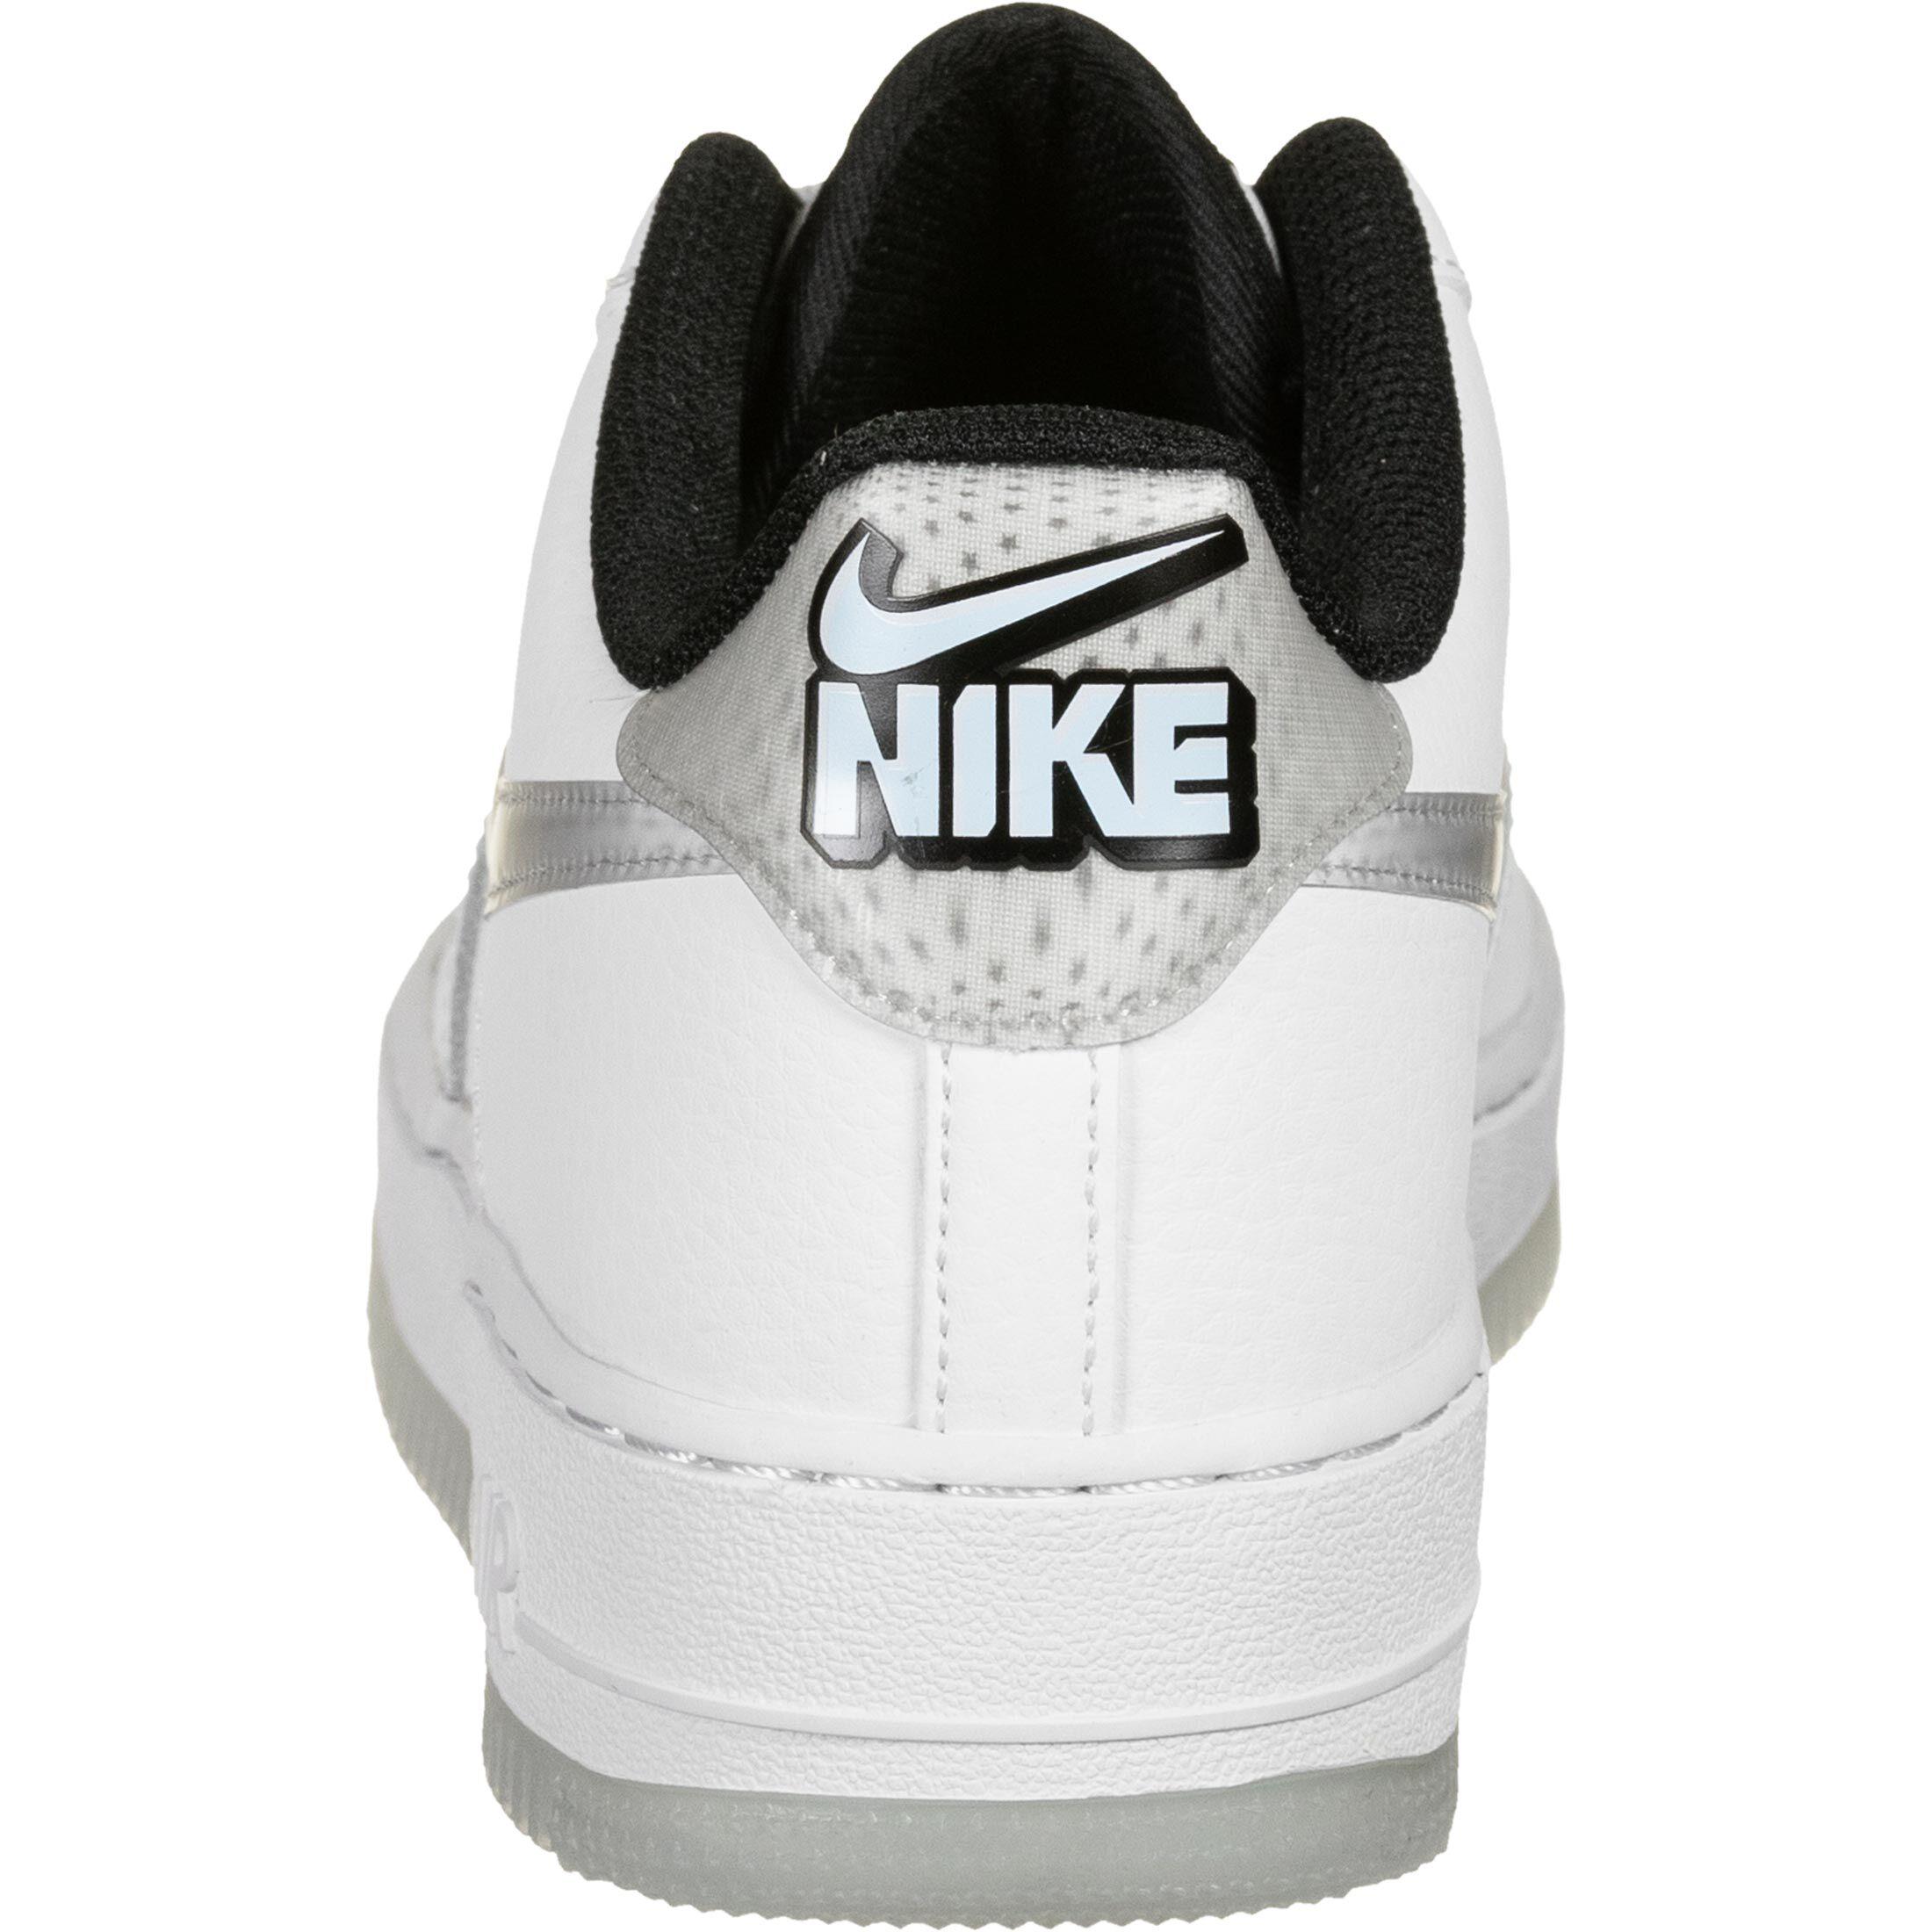 Nike Air Force 1 LV8 KSA - Basketball at Stylefile